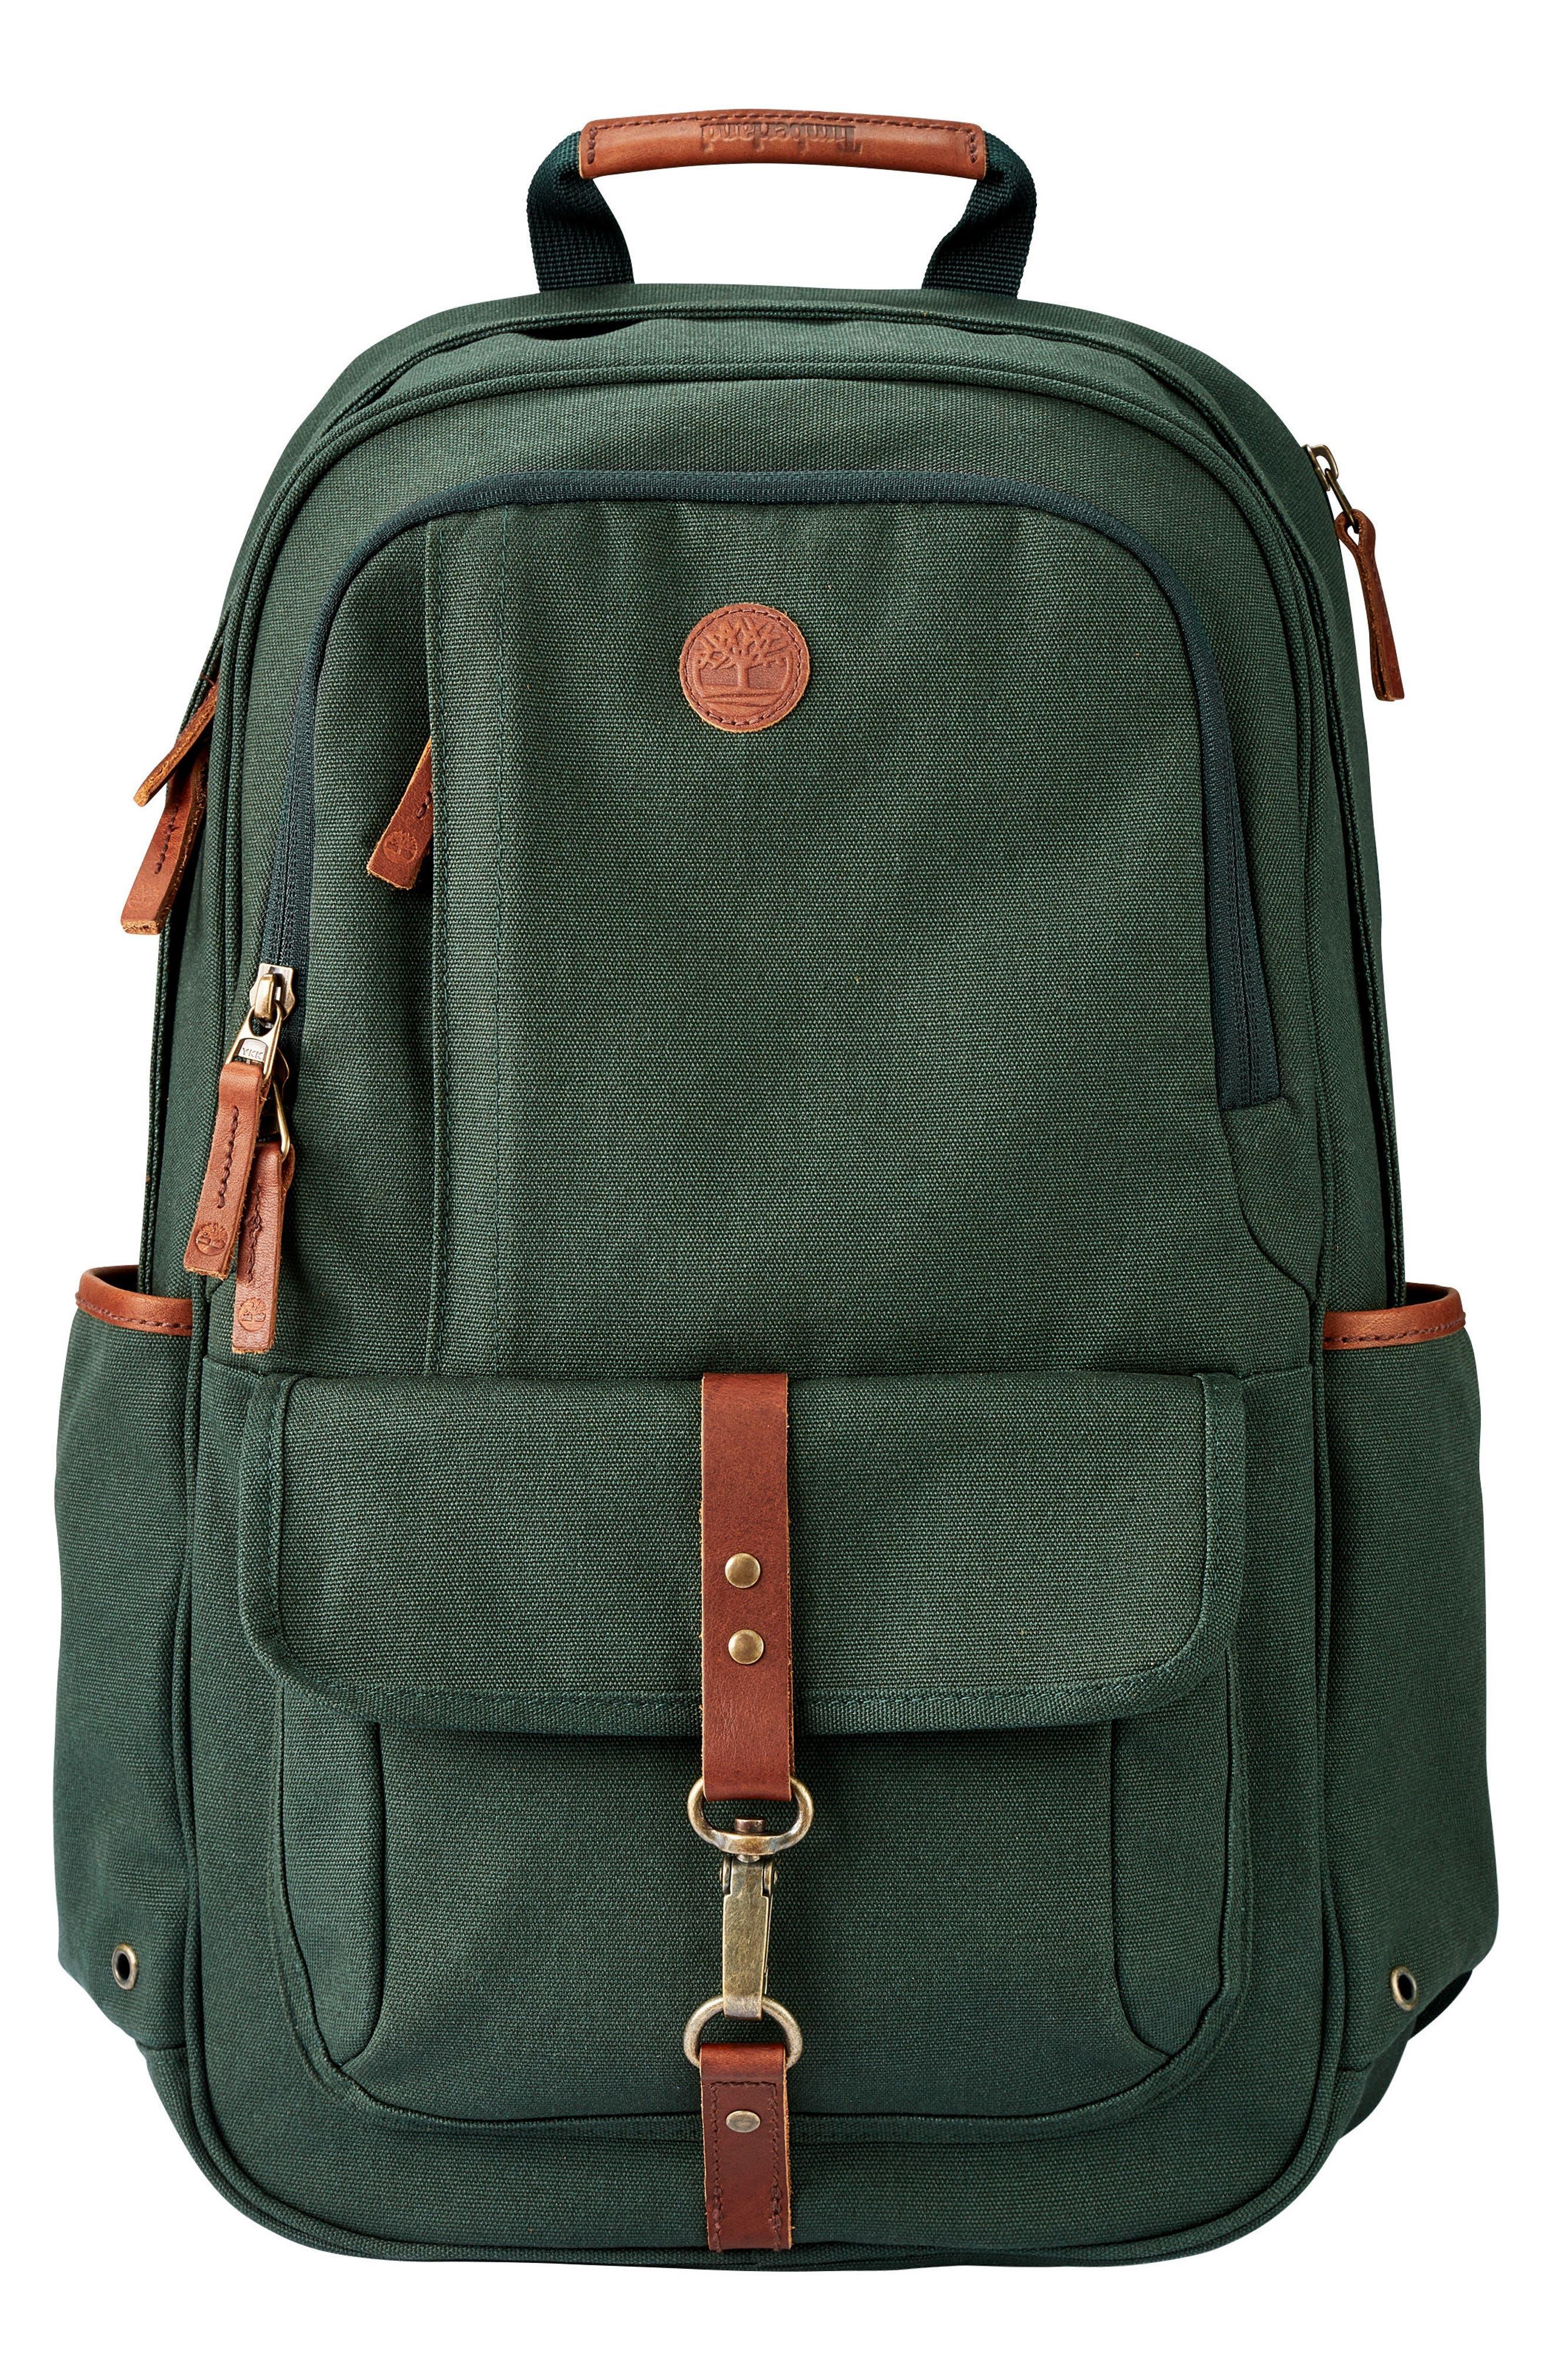 Timberland Walnut Hill Backpack